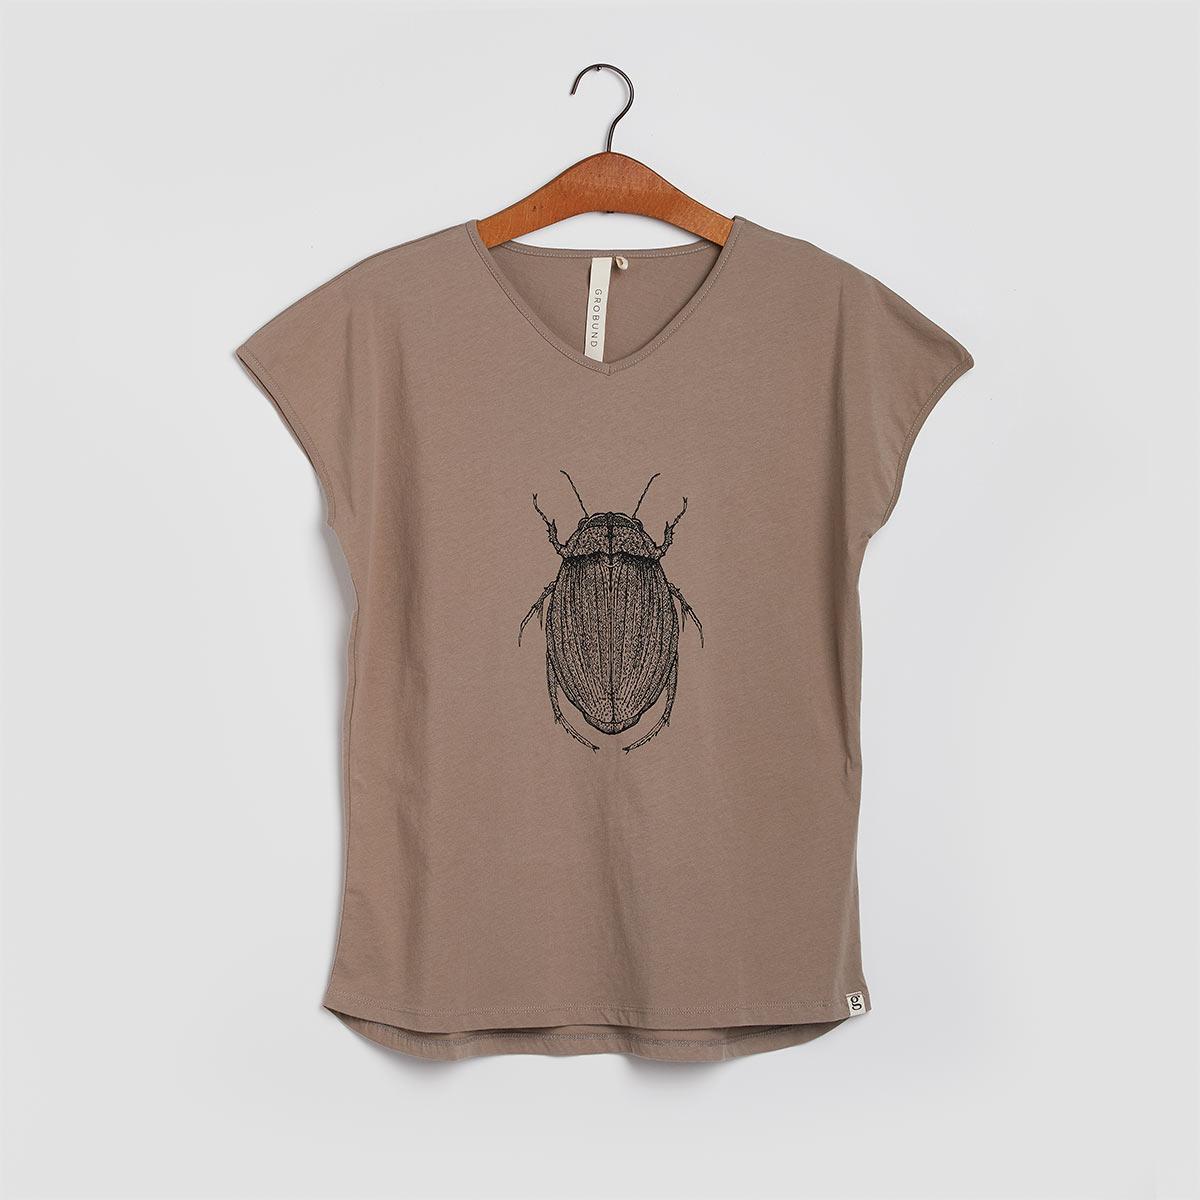 T-shirten den med vandkalven i moler fra GROBUND